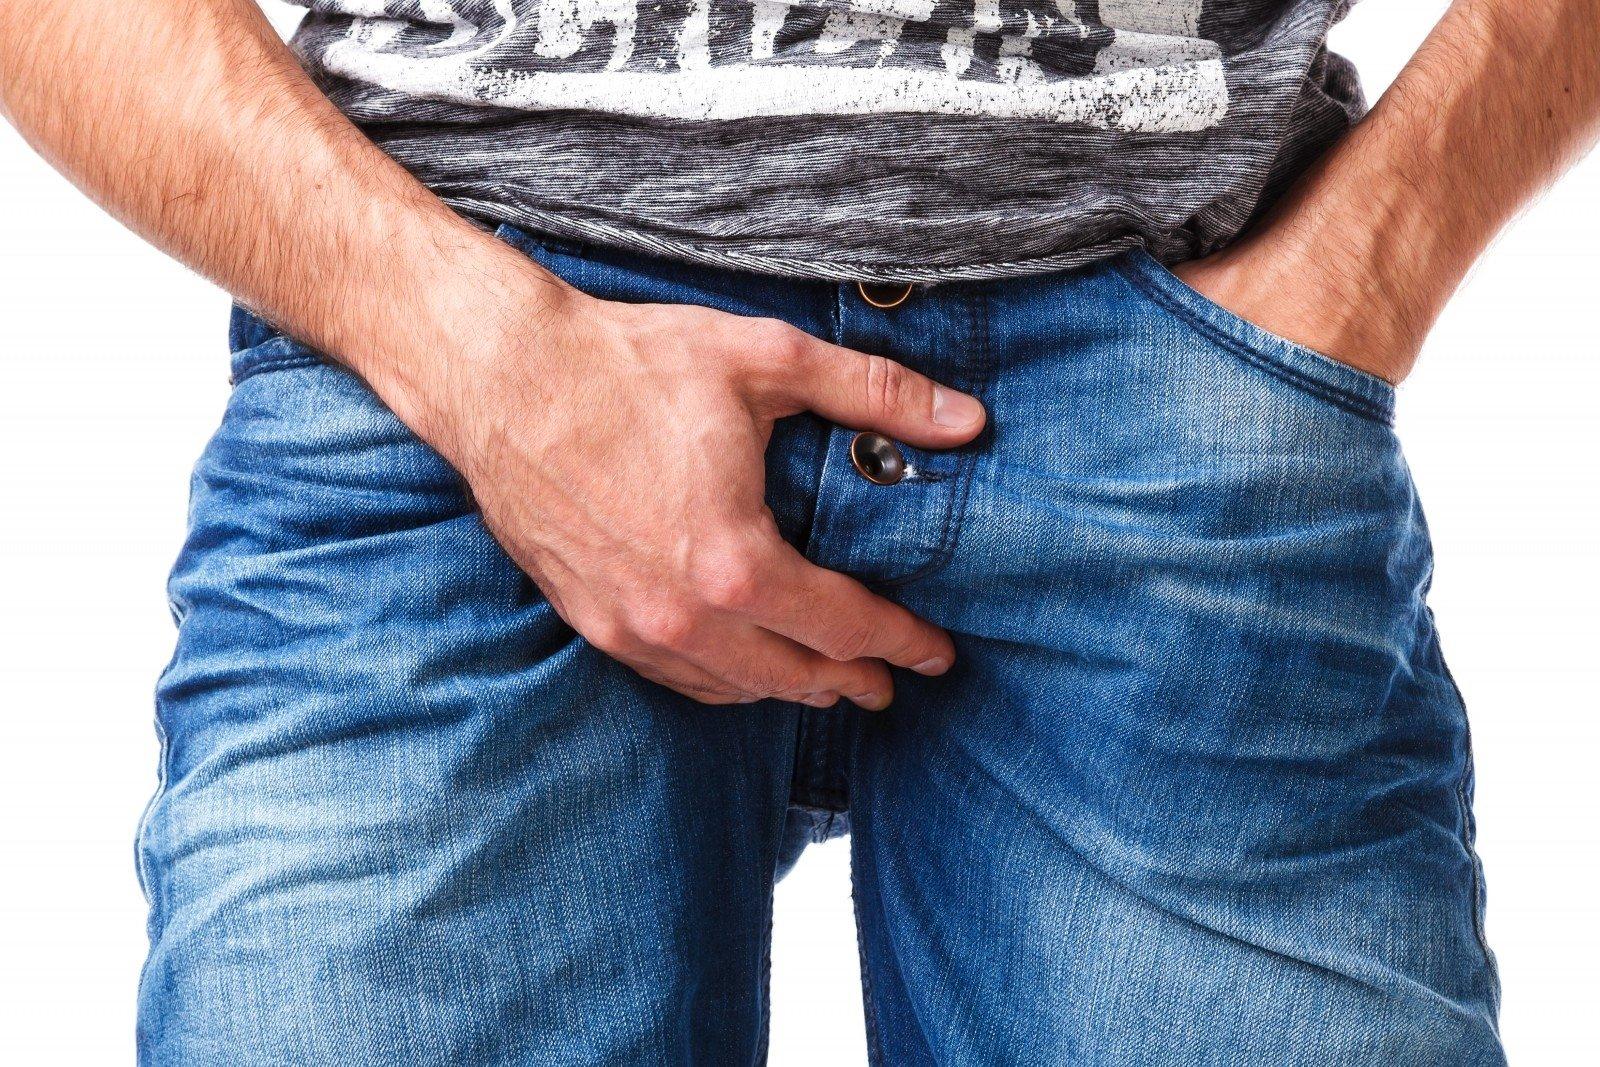 Penice dydis 12 cm